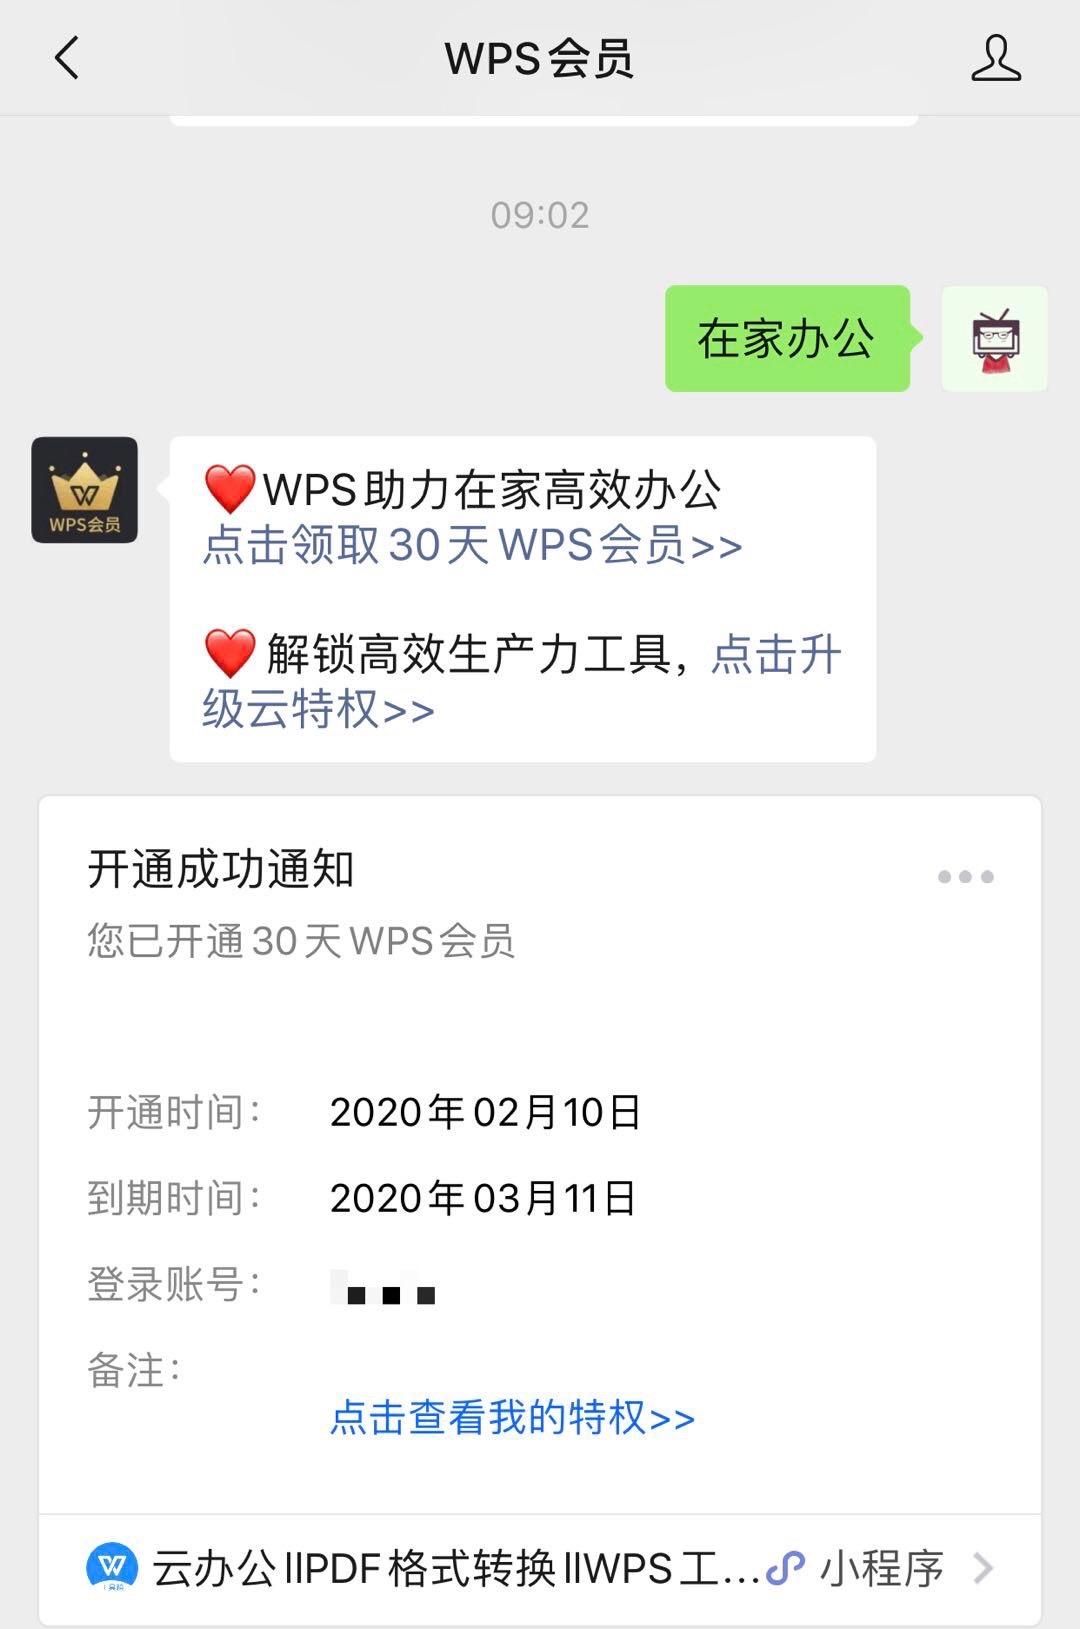 ▲ WPS会员